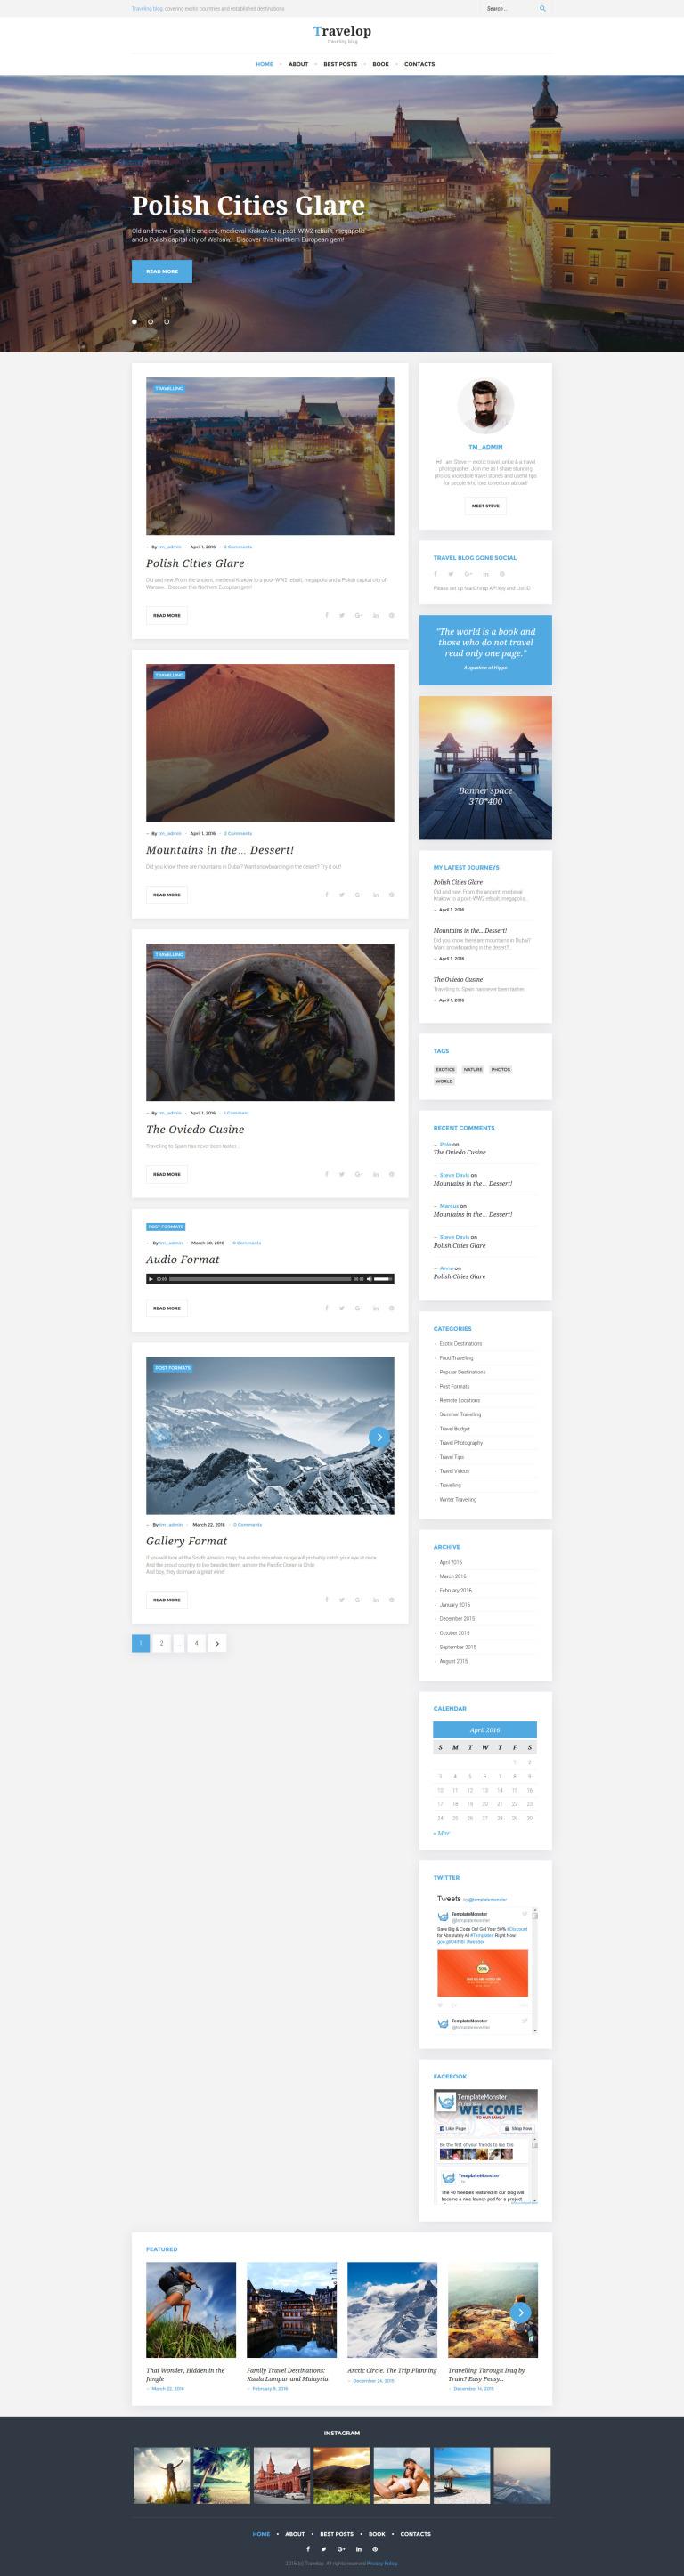 Travelop - Traveling Blog WordPress Theme New Screenshots BIG